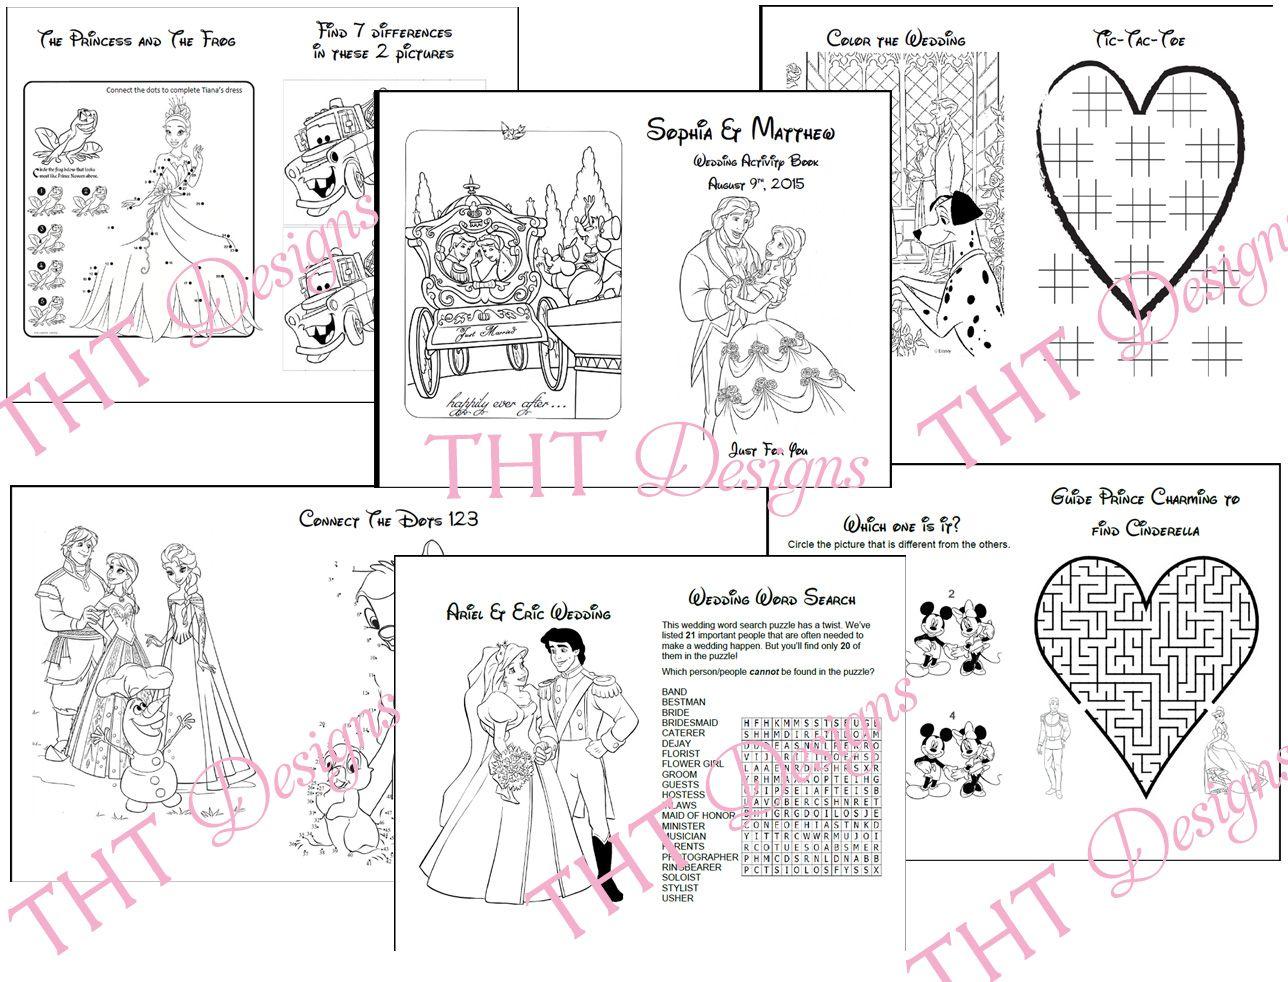 Disney theme wedding activity book printable wedding printable